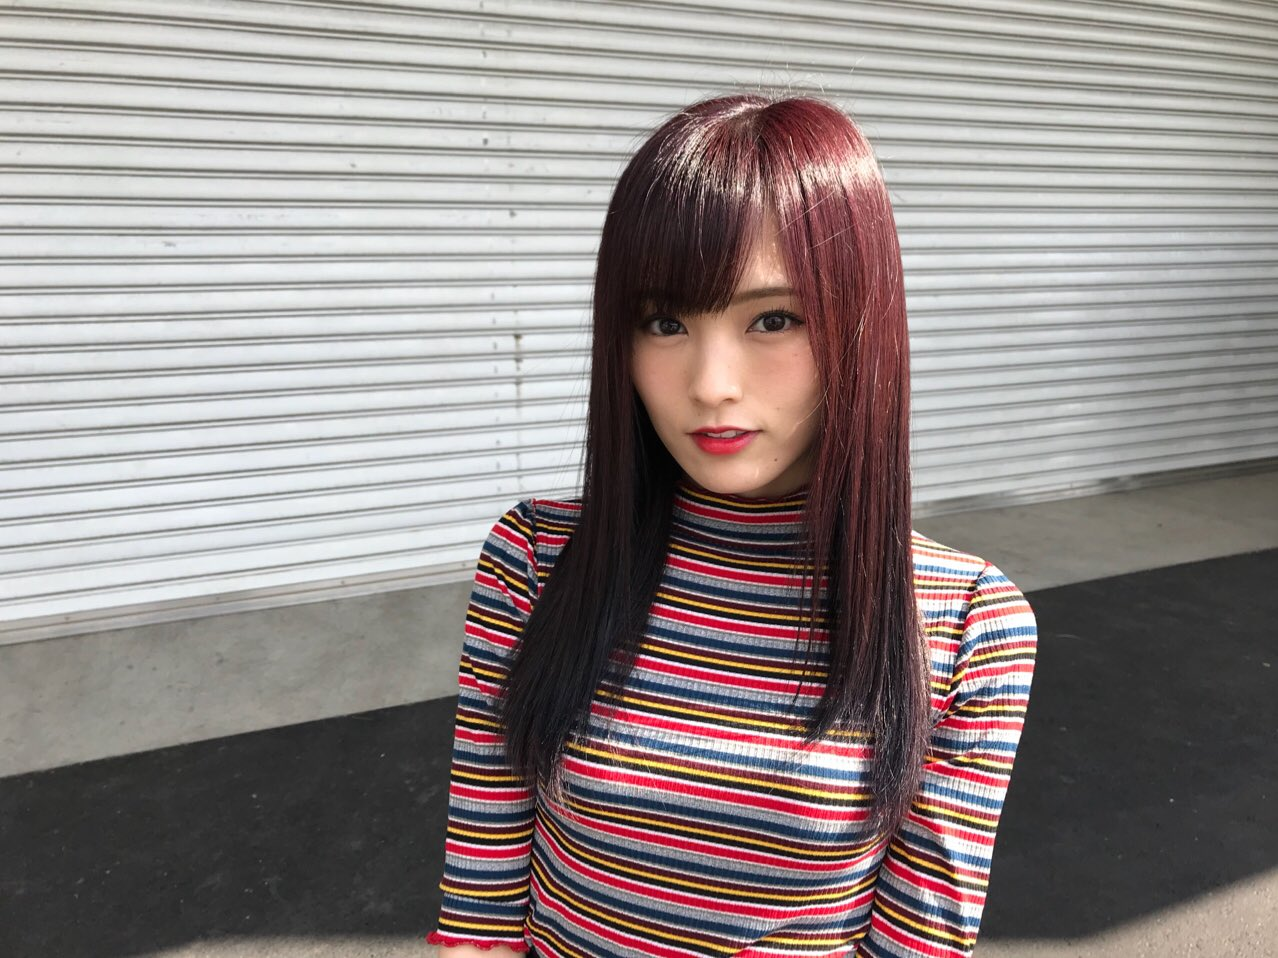 【NMB48】さや姉ことエース・山本彩がグループ卒業を発表 会場騒然